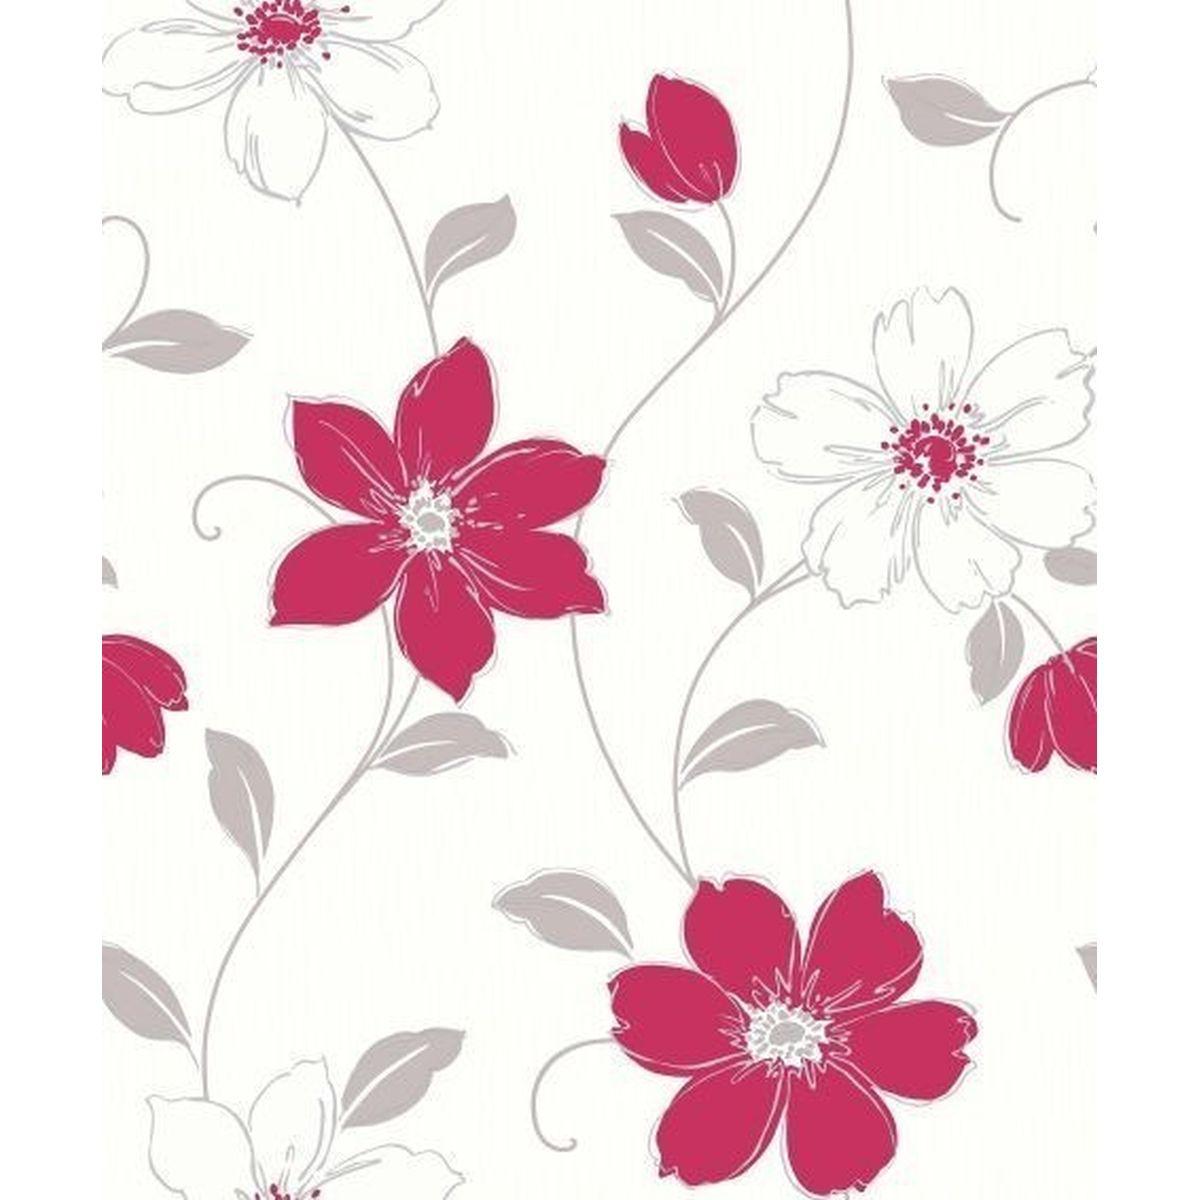 Best of Arthouse Vliestapete Prächtiges Design 871104 Rot Blumentapete